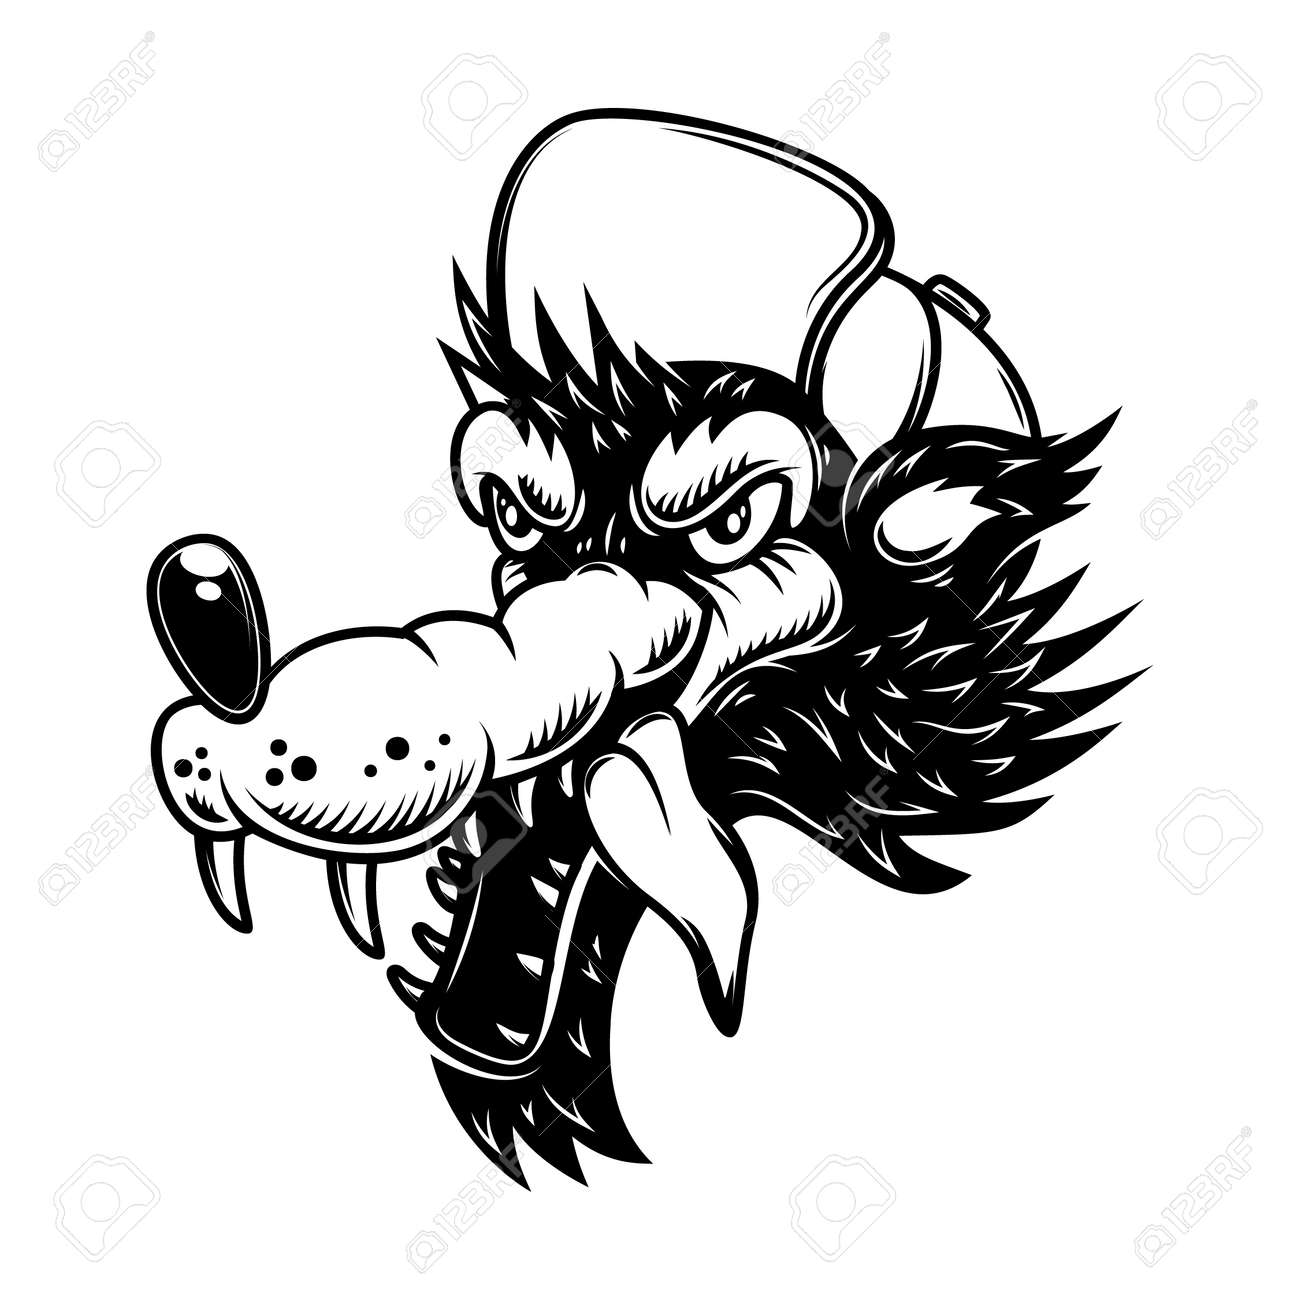 Illustration of cartoon wolf in baseball cap. Design element for poster, card, banner, sign . Vector illustration - 170554431